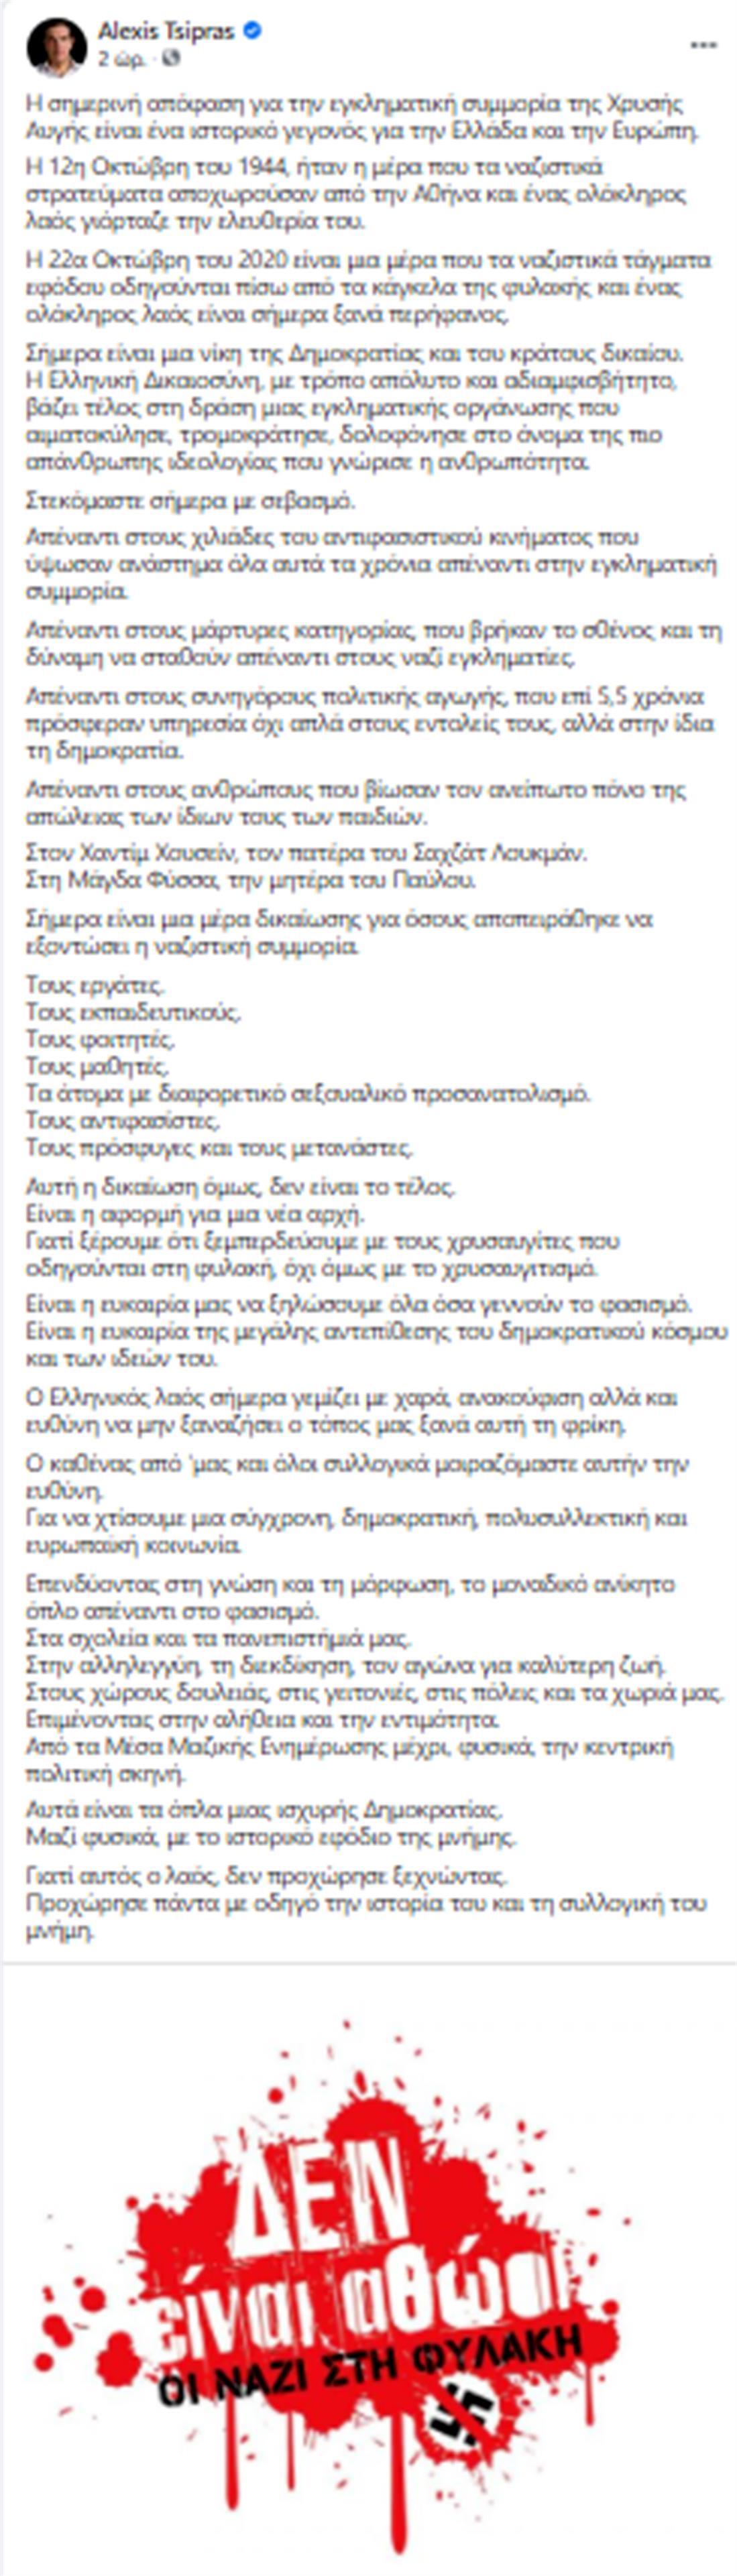 Facebook - Τσίπρας